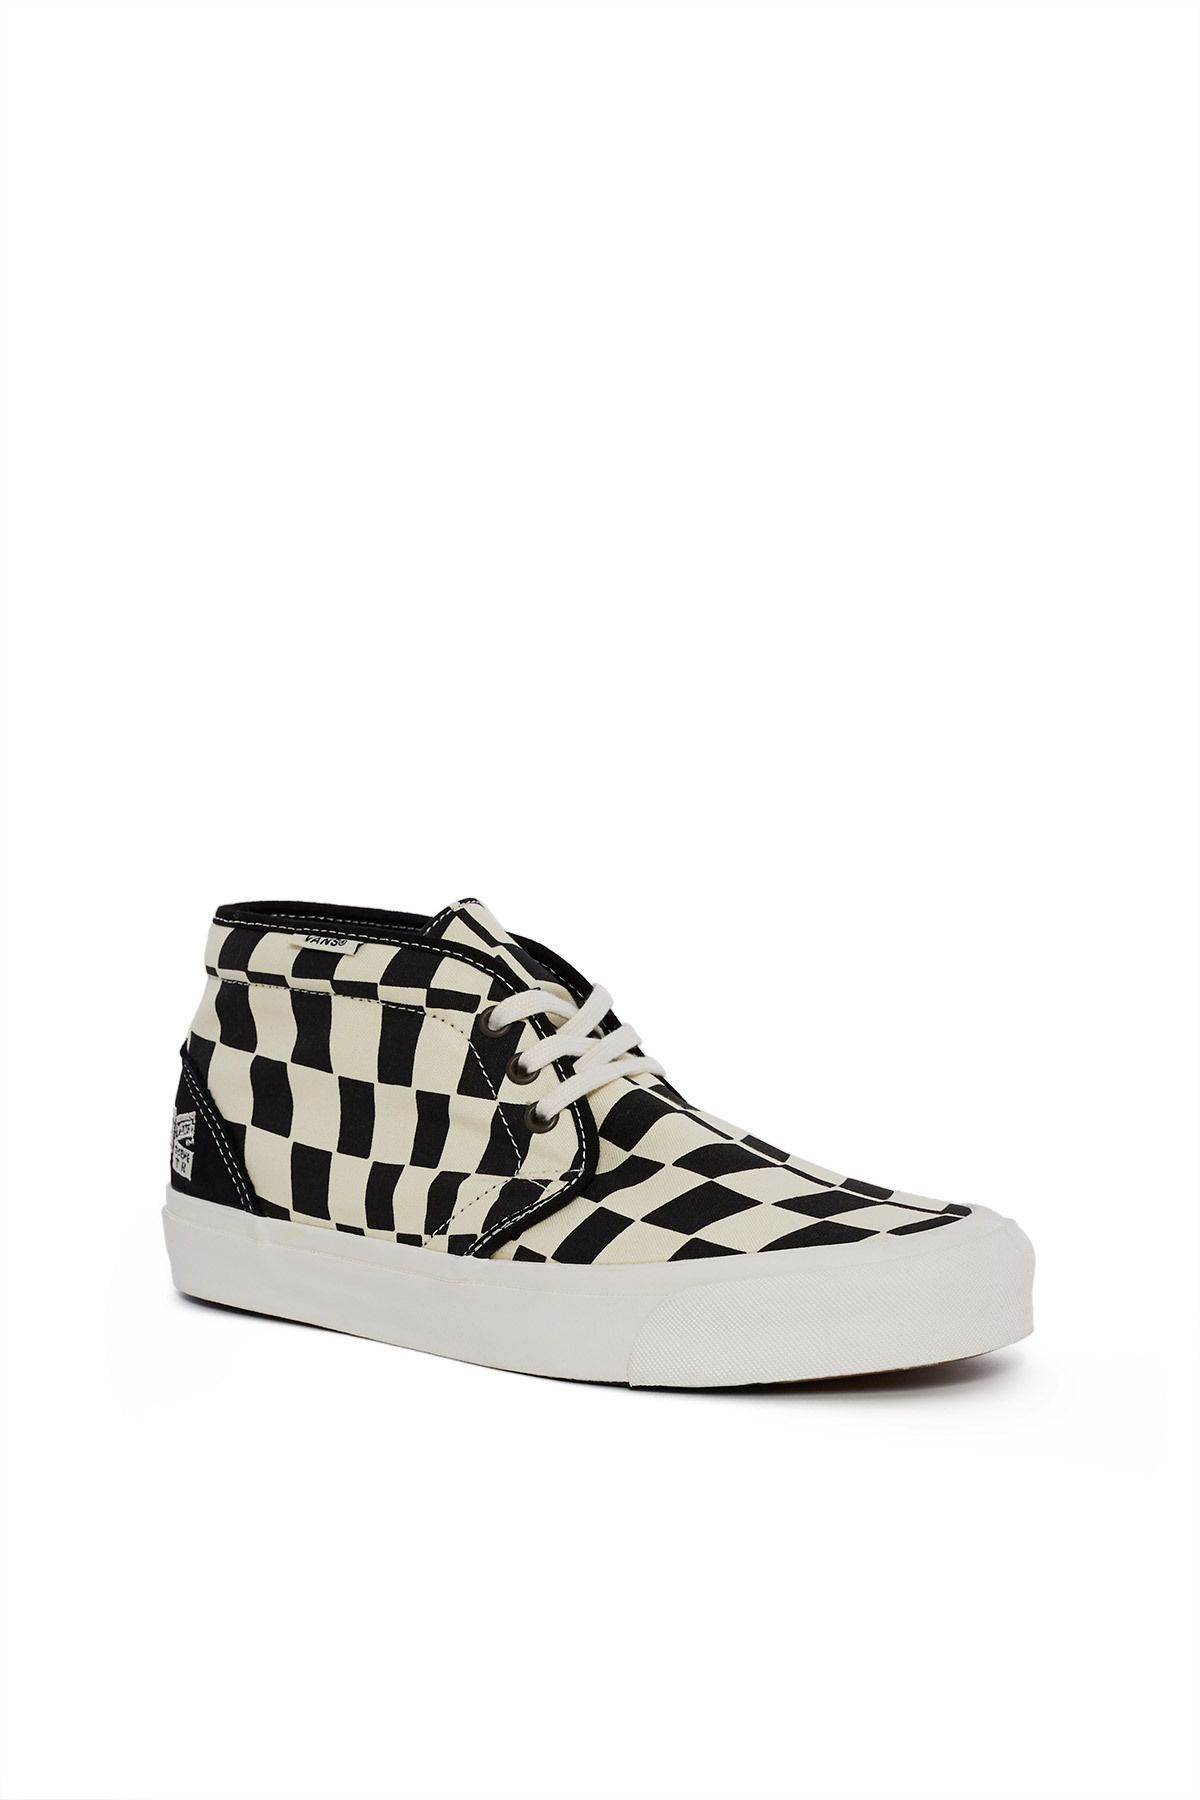 TH Chukka 75 LX Sneaker